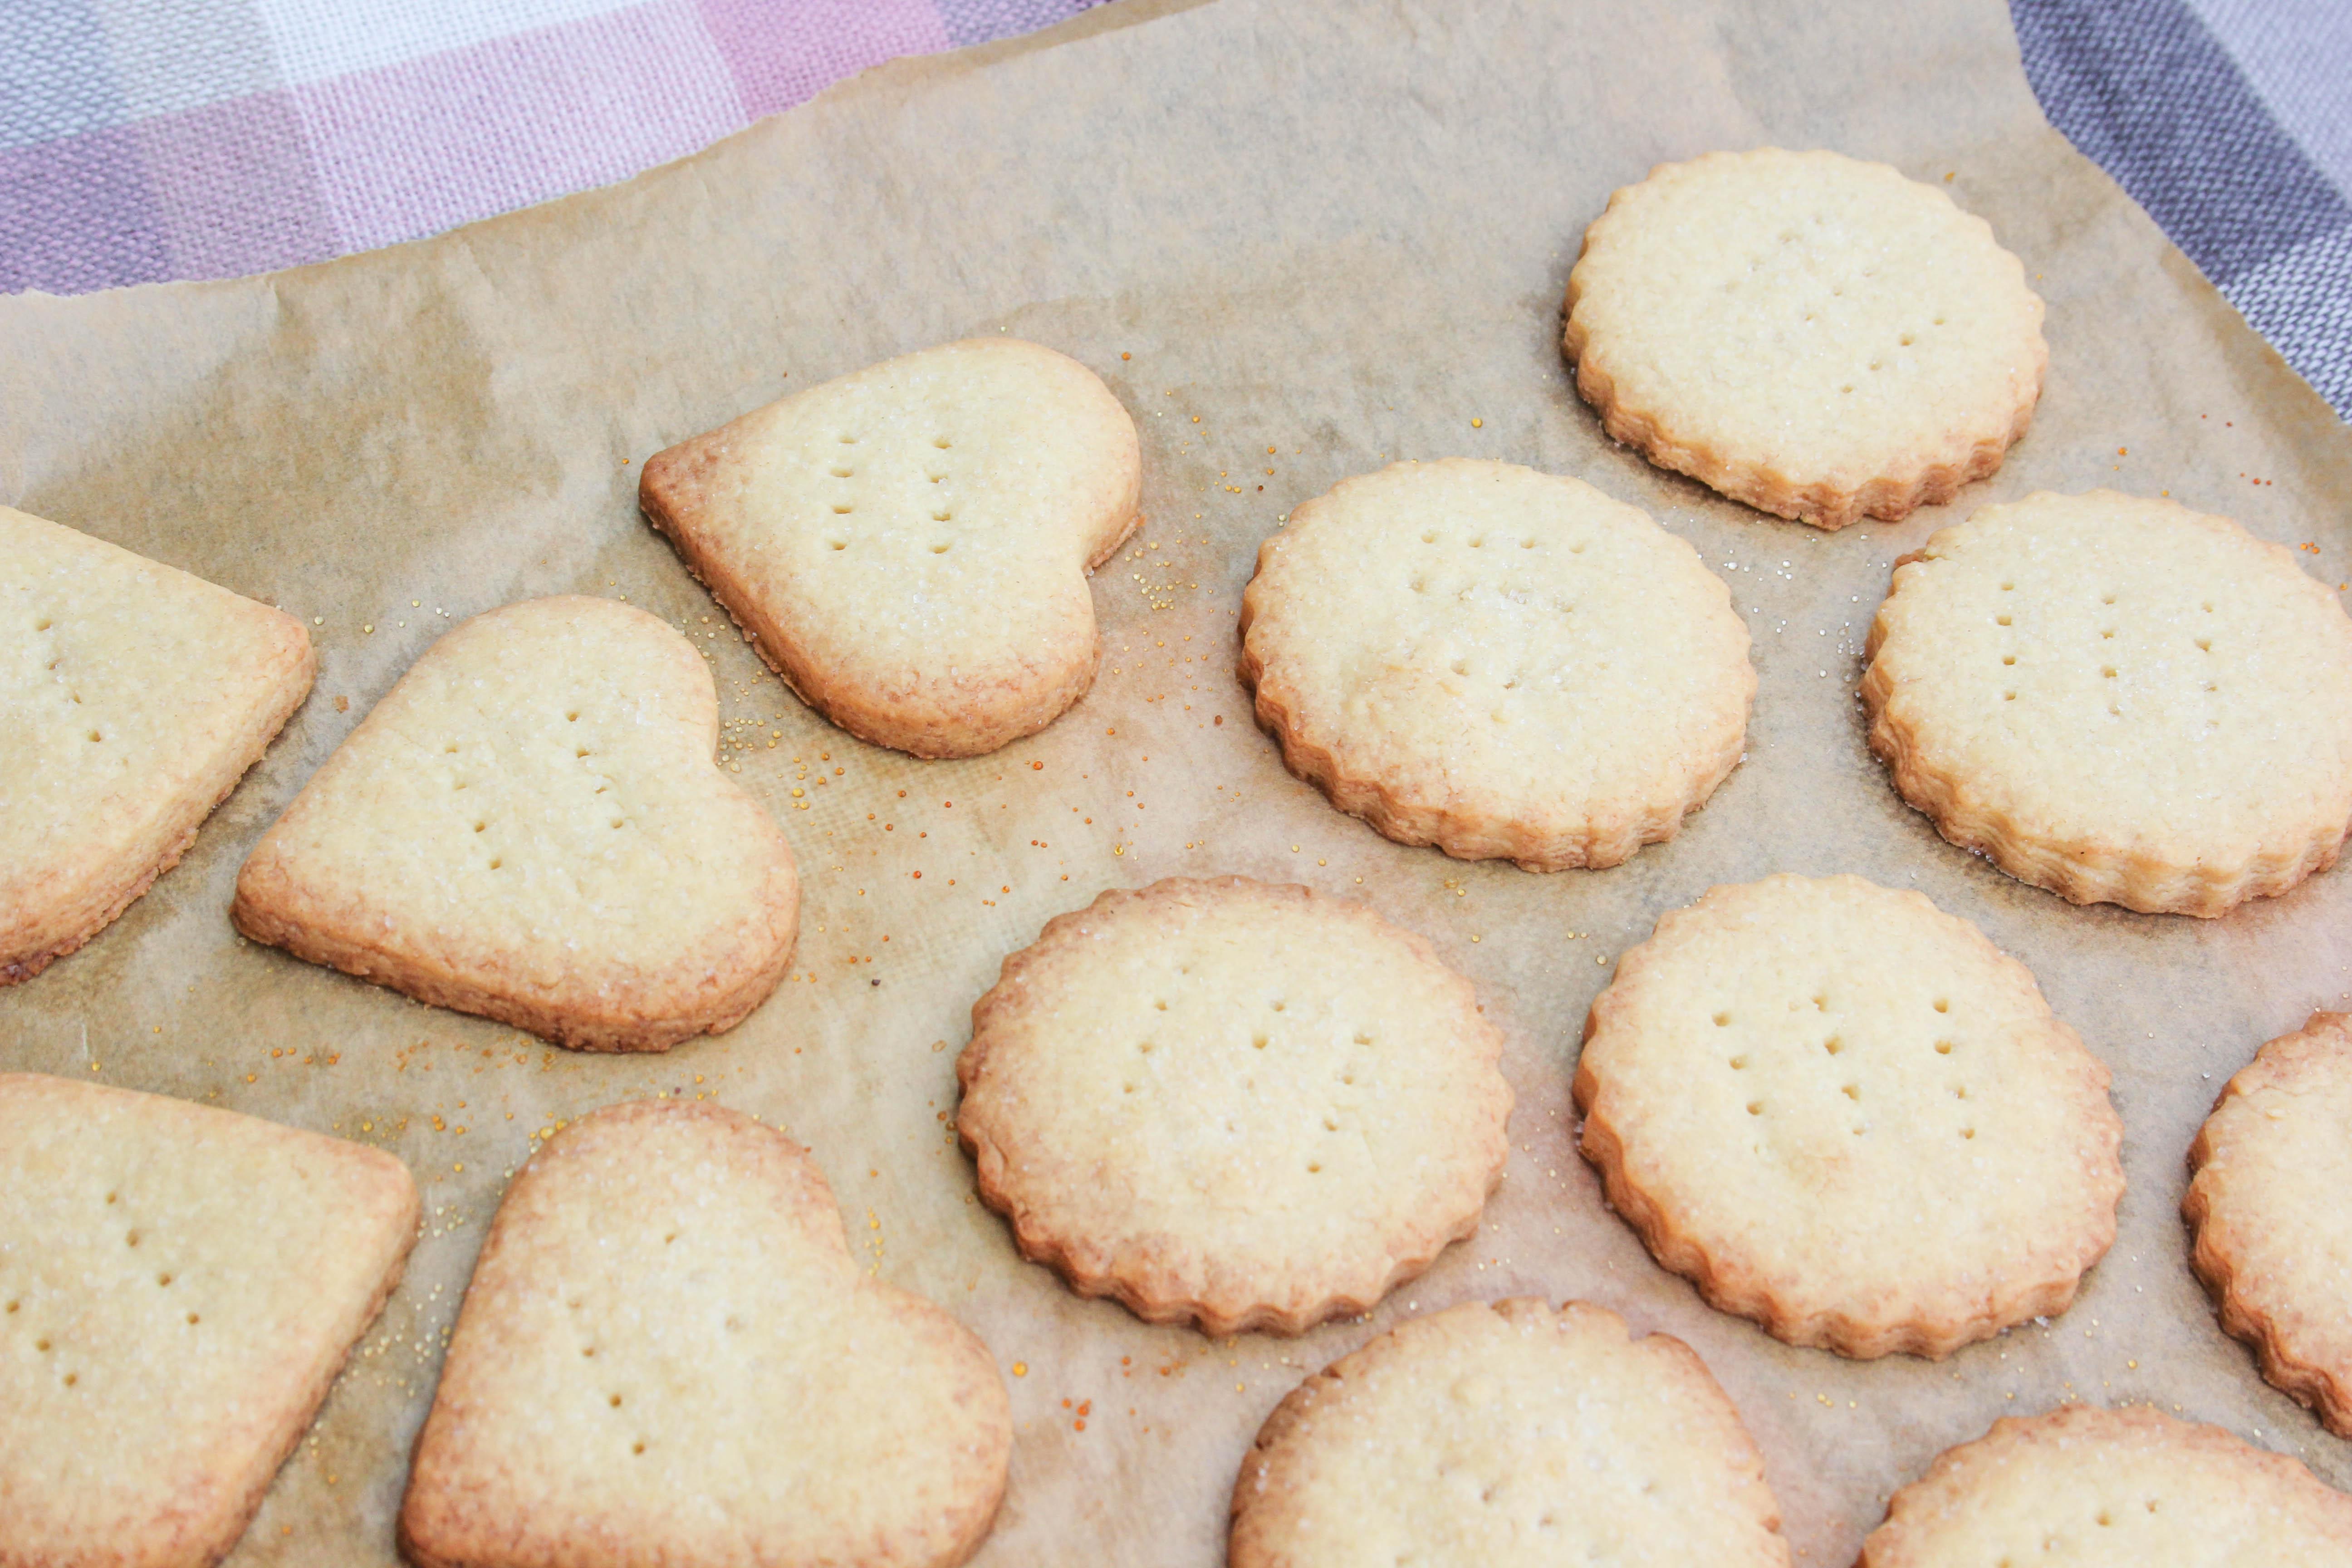 Pieday Friday - Shortbread for Burns Night or Valentines